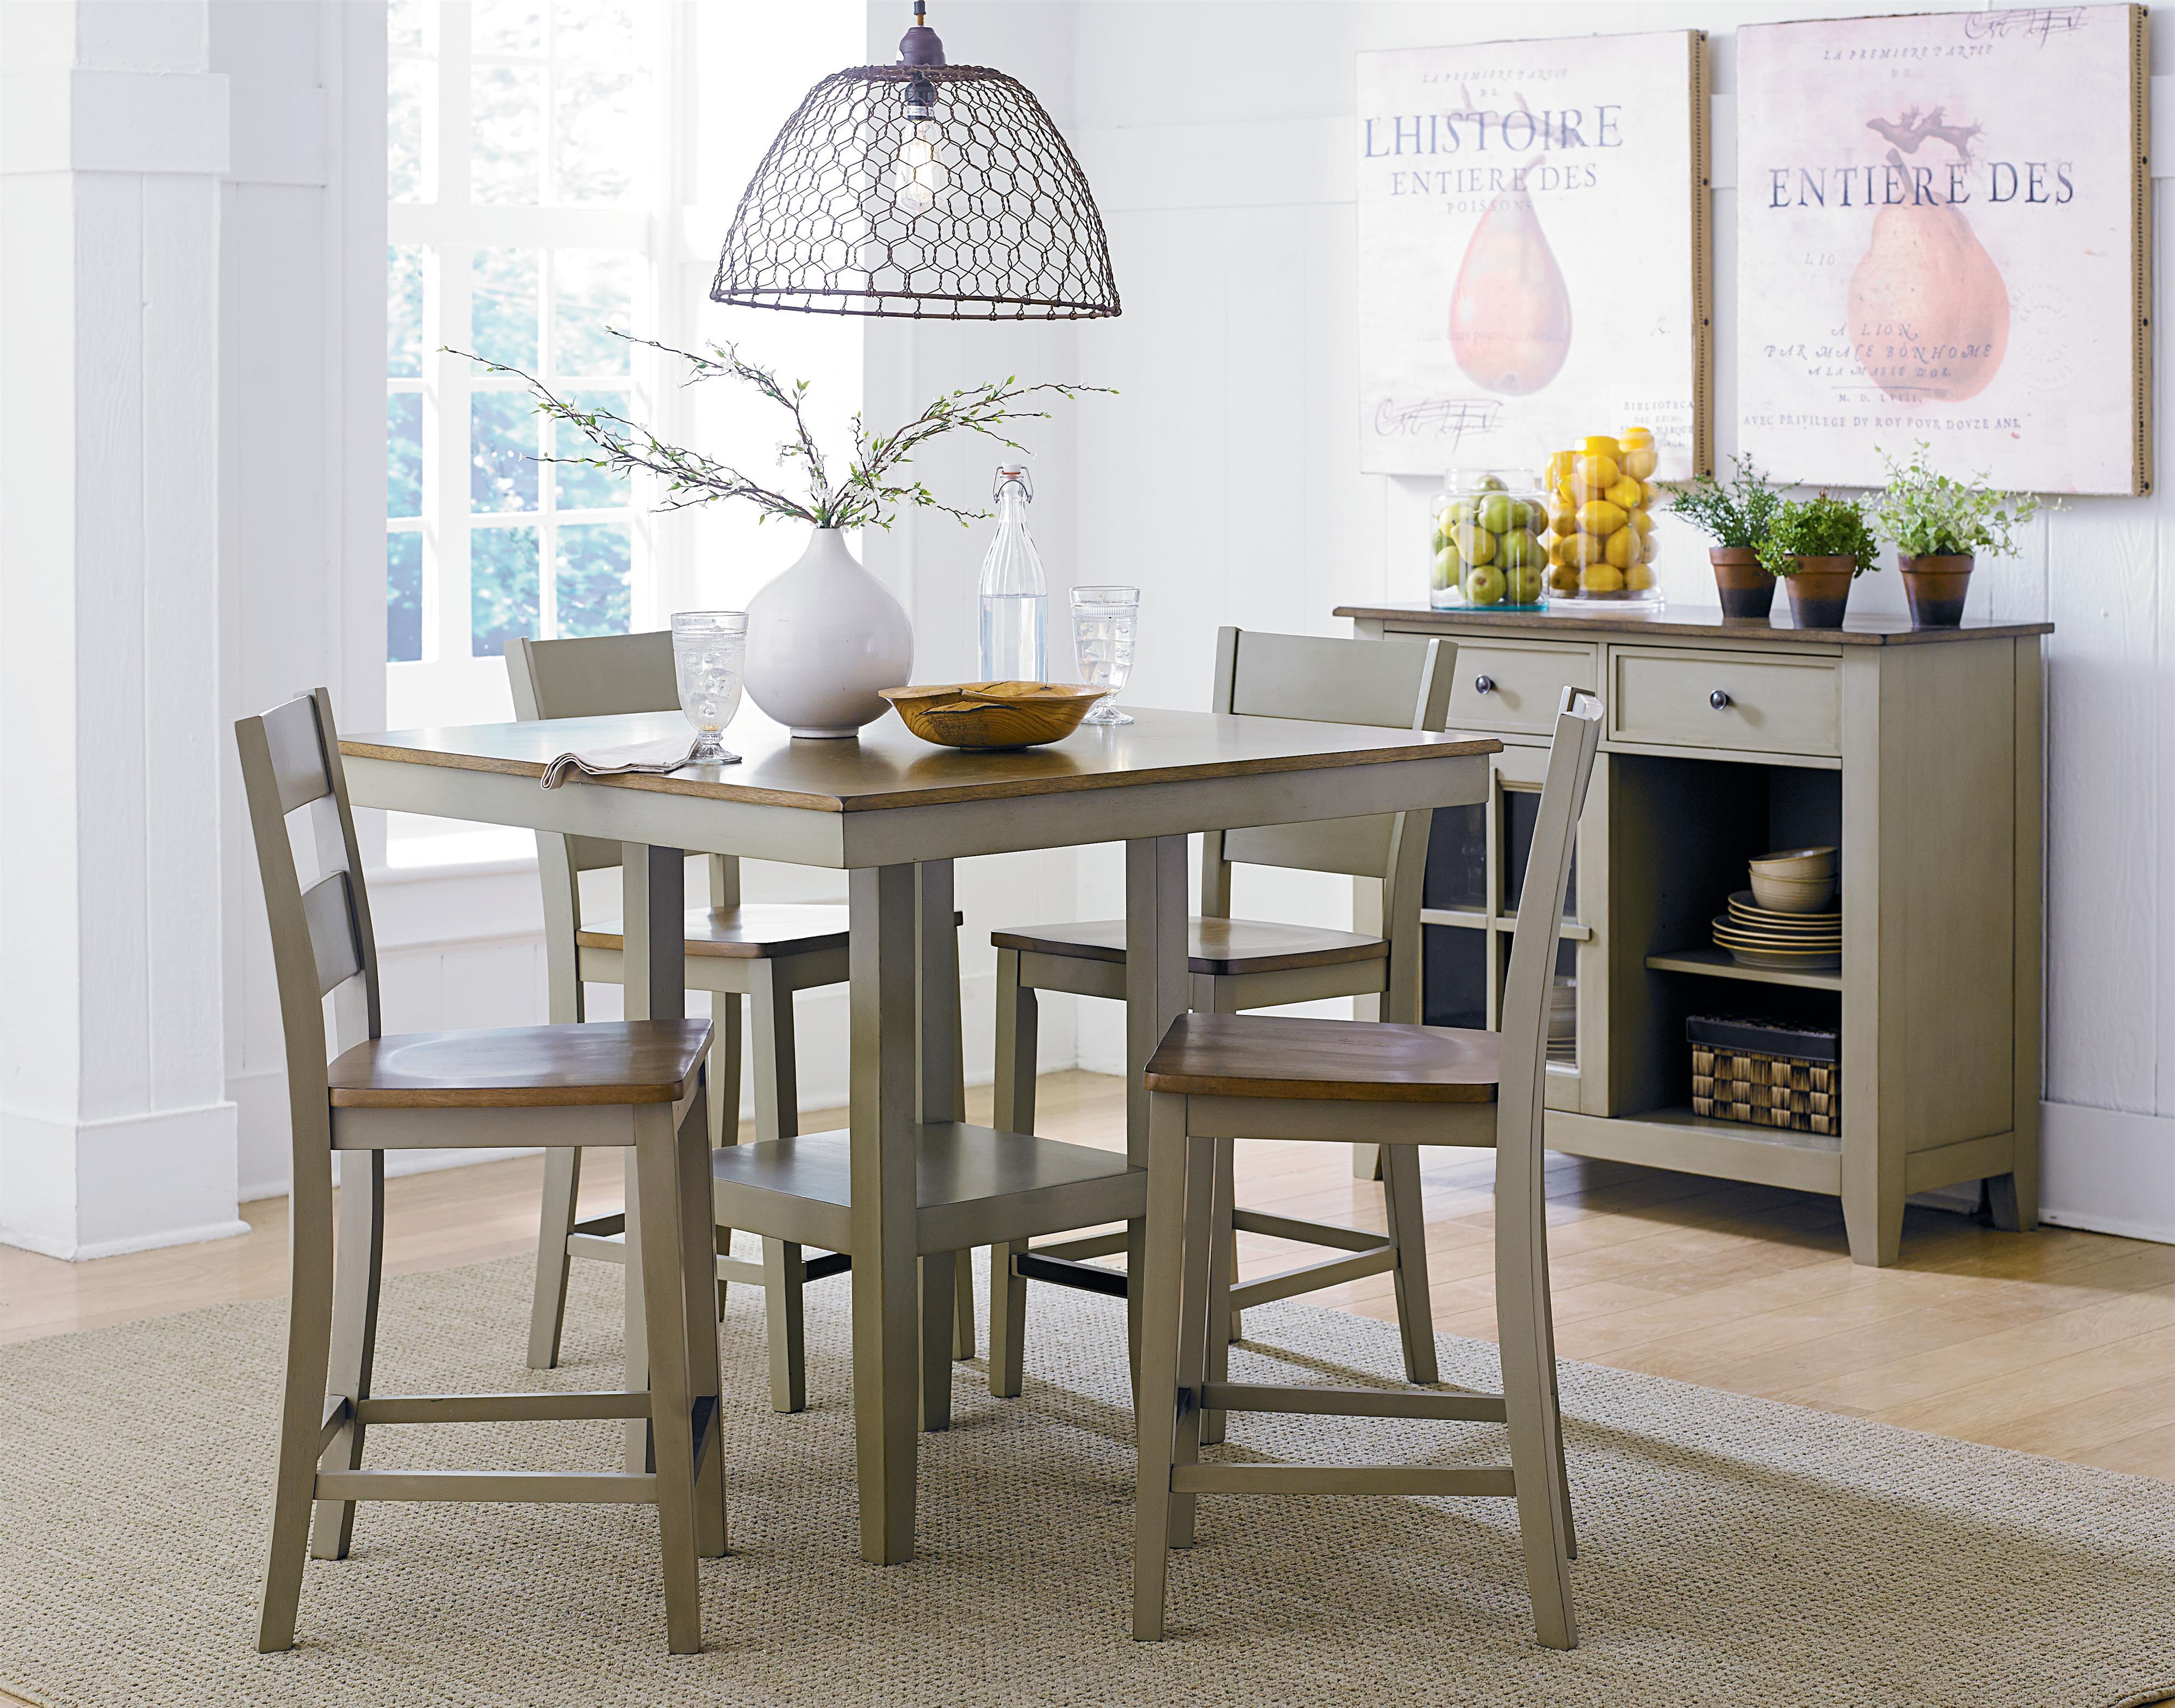 Standard Furniture Pendwood Sage Casual Dining Room Group - Item Number: 15620 Dining Room Group 2